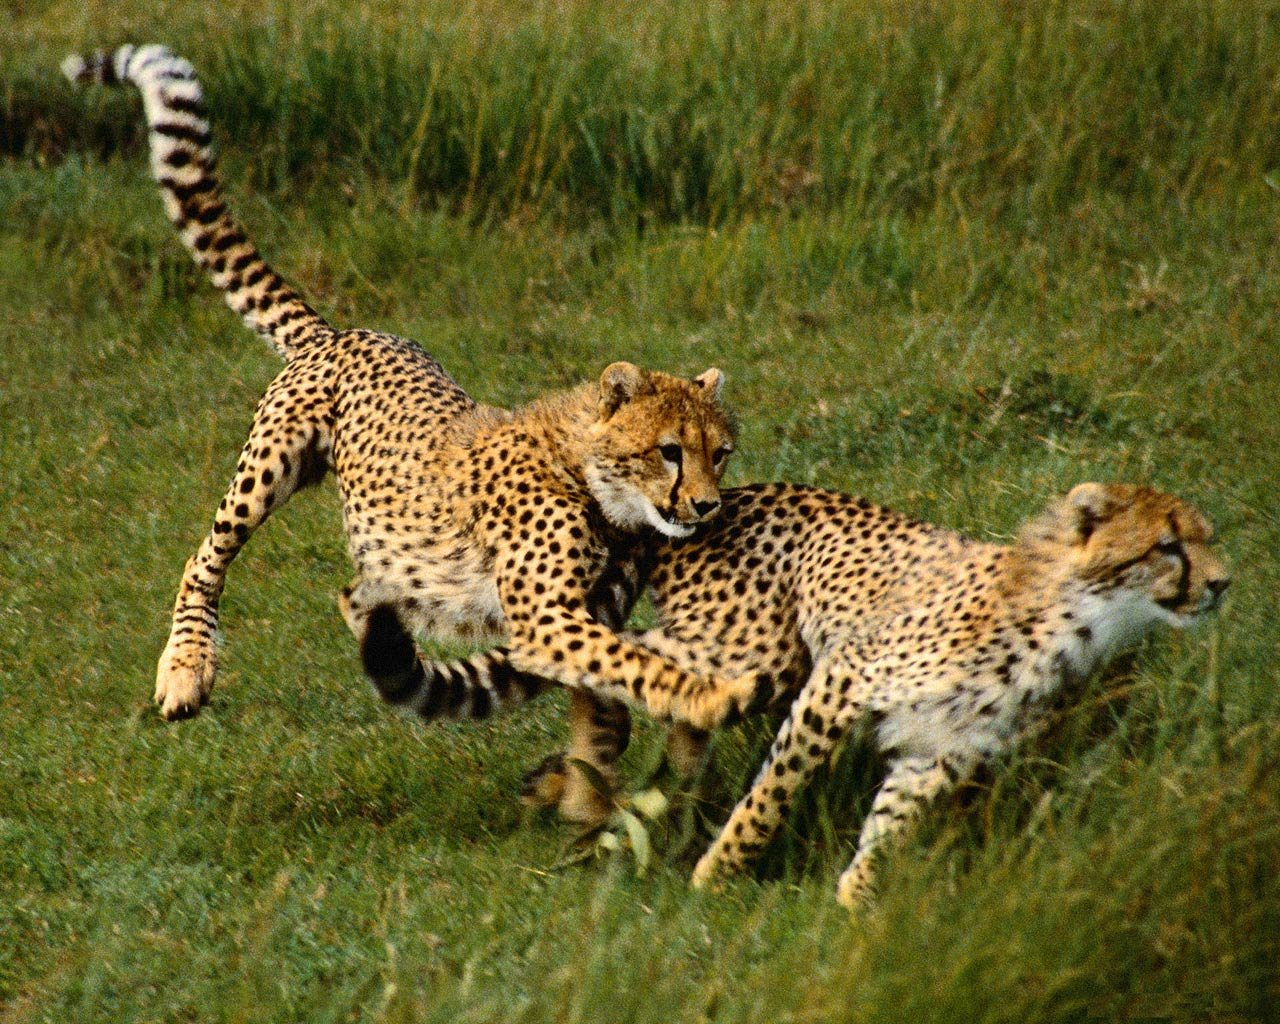 Beautiful Animals Safaris: The Fastest Cheetah In The